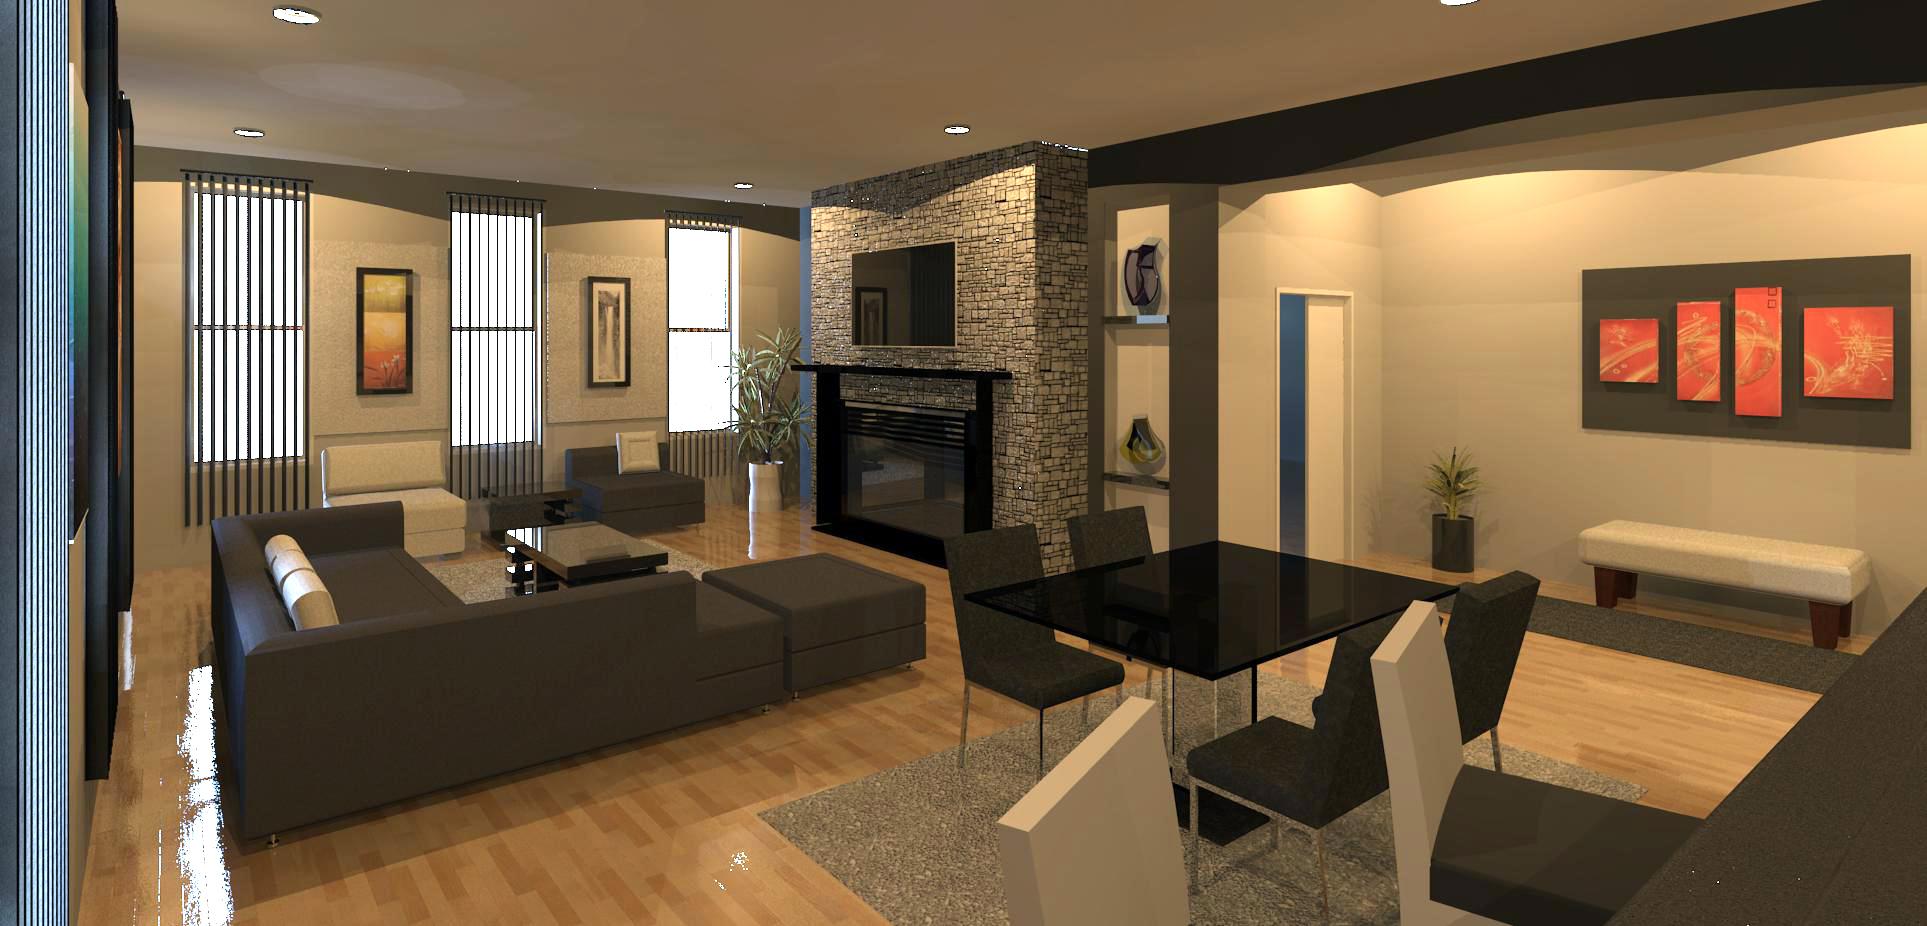 Design Designed By Ken Howder Condo Interior Design Philadelphia